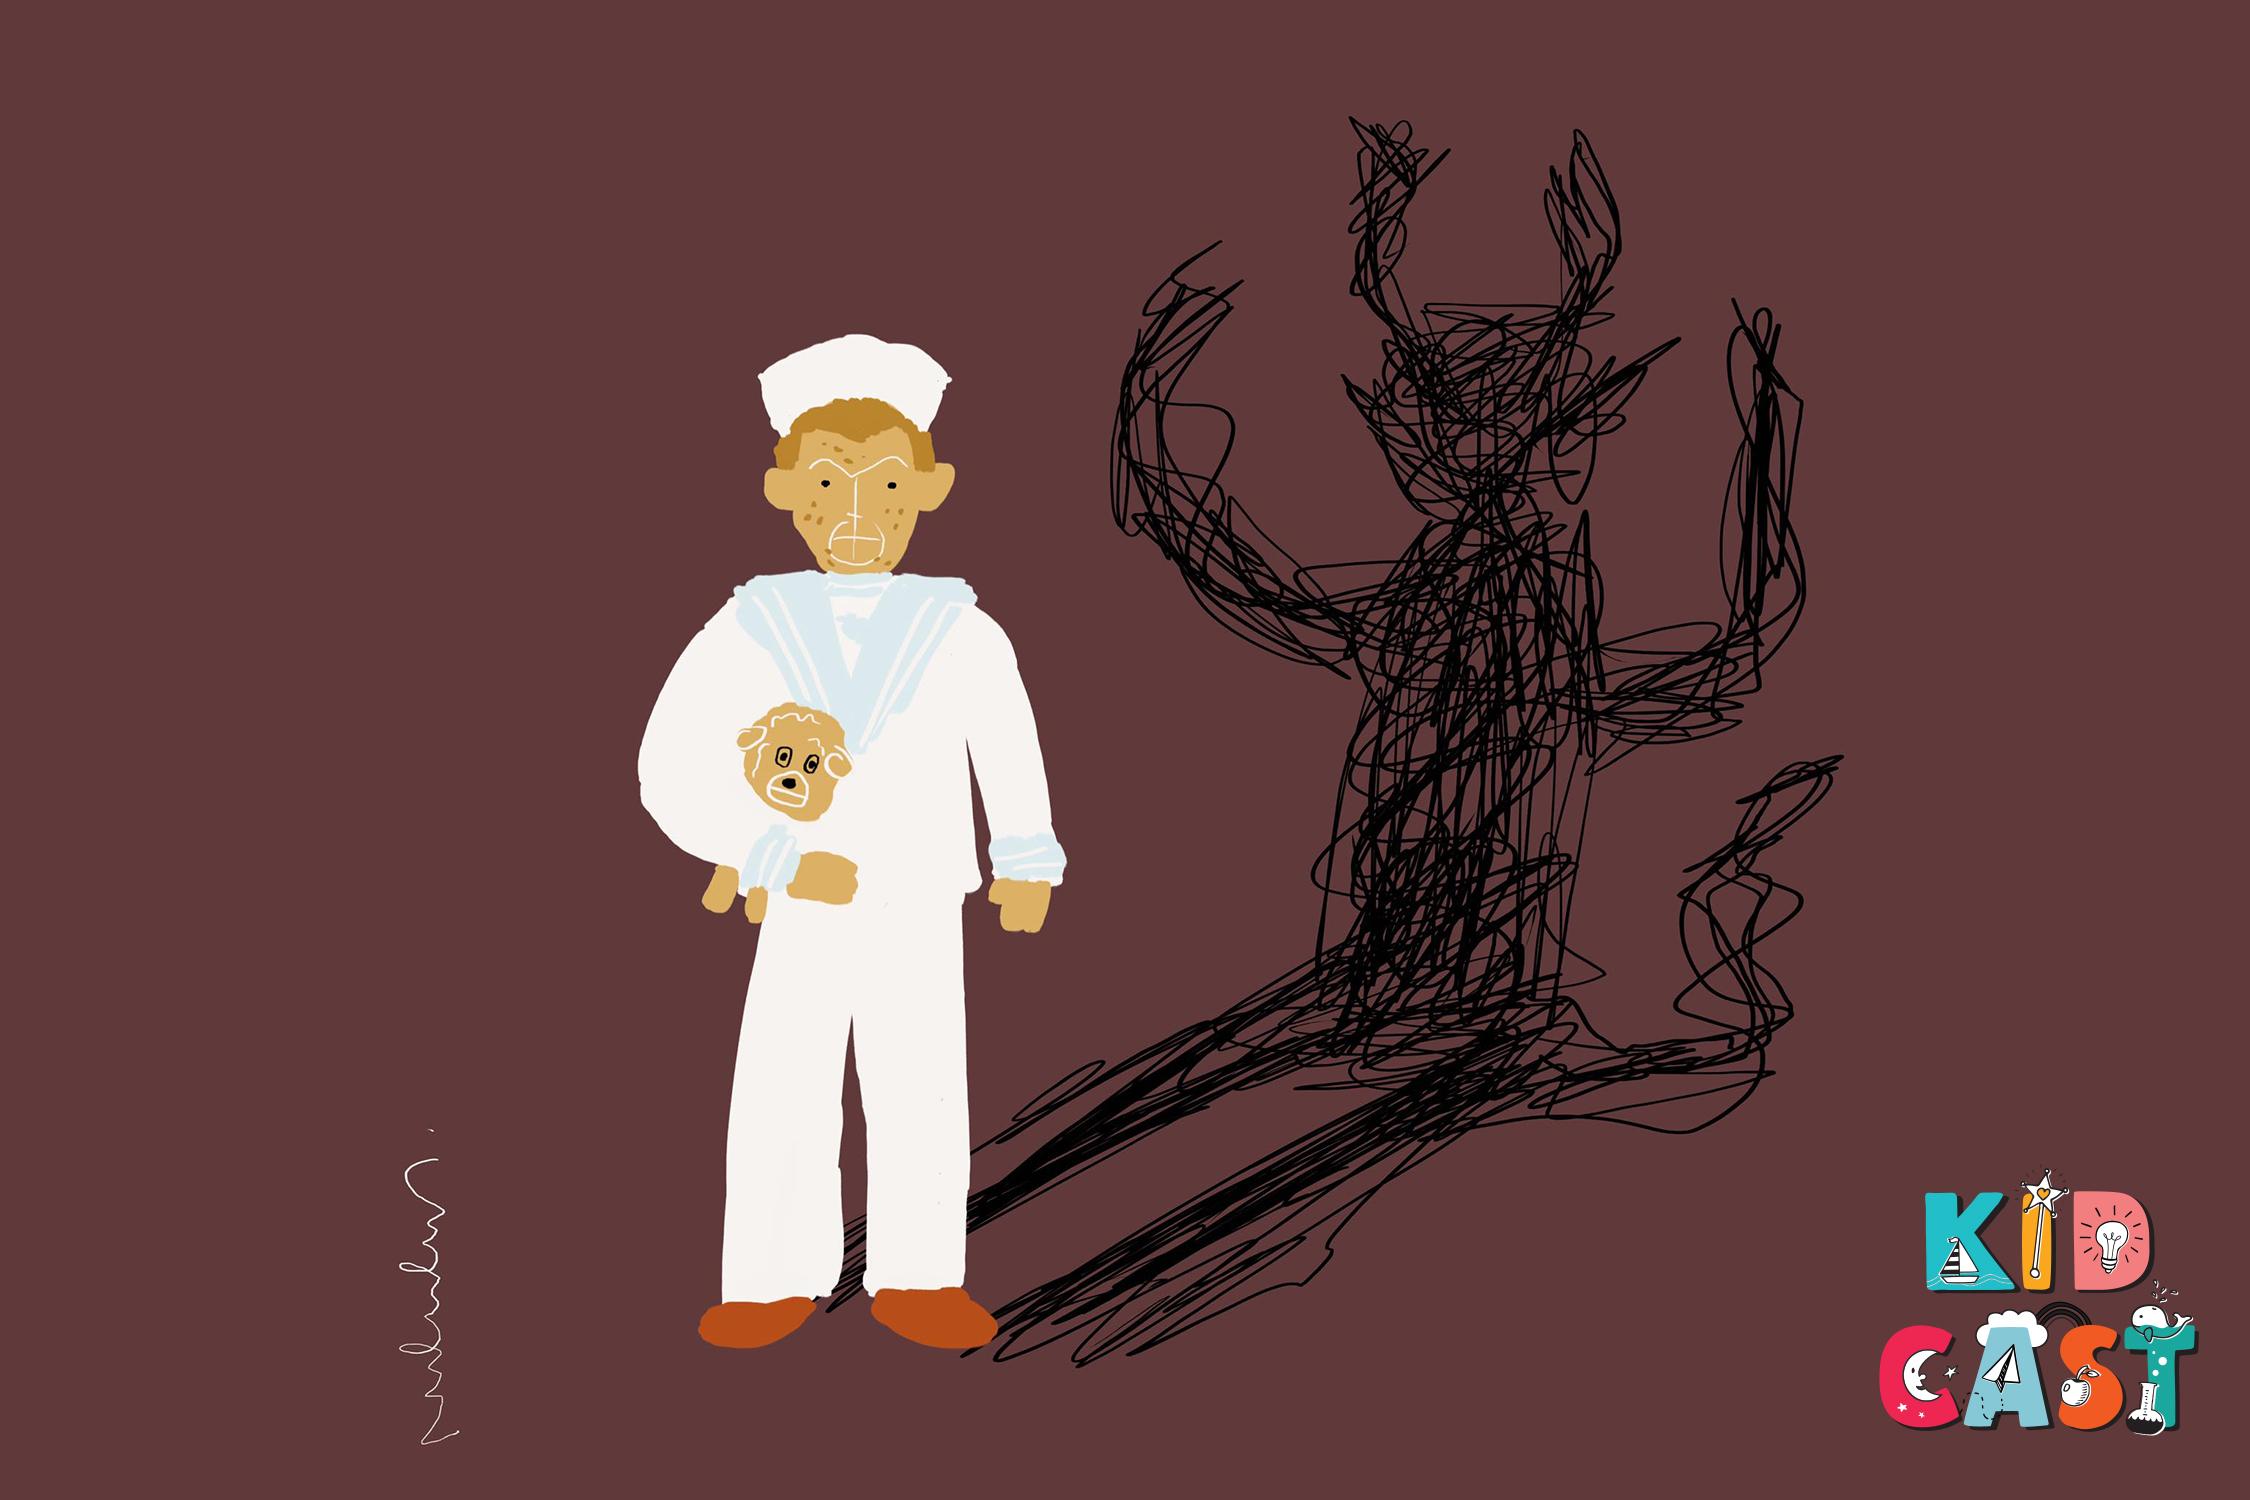 Kidcast (Podcast) EP 7 : Robert the doll ตุ๊กตาผีต้นแบบของชัคกี้